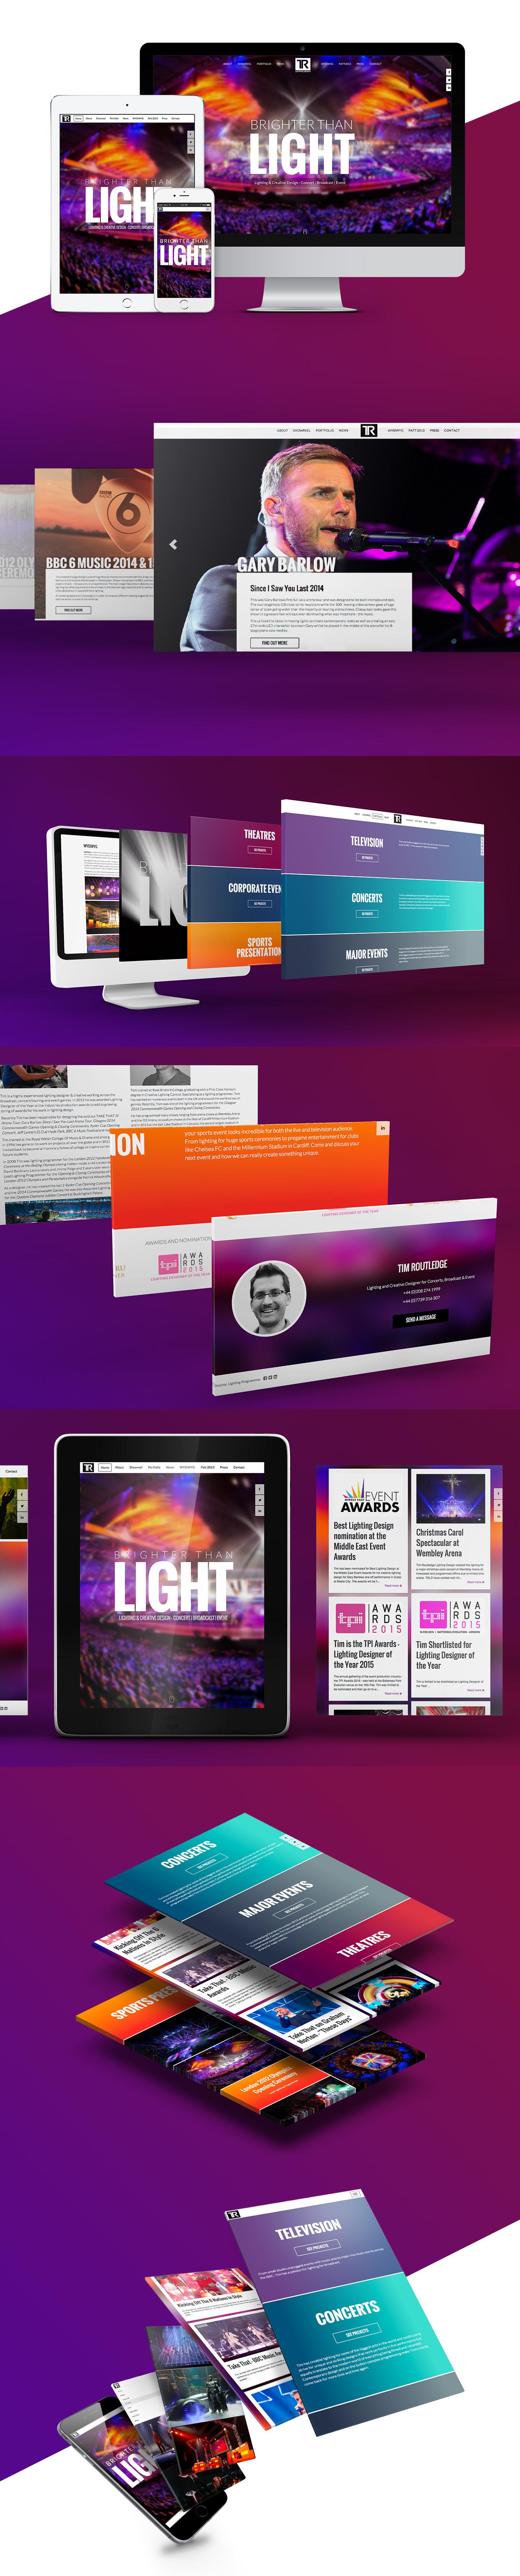 Responsive website design for Tim Routledge's website